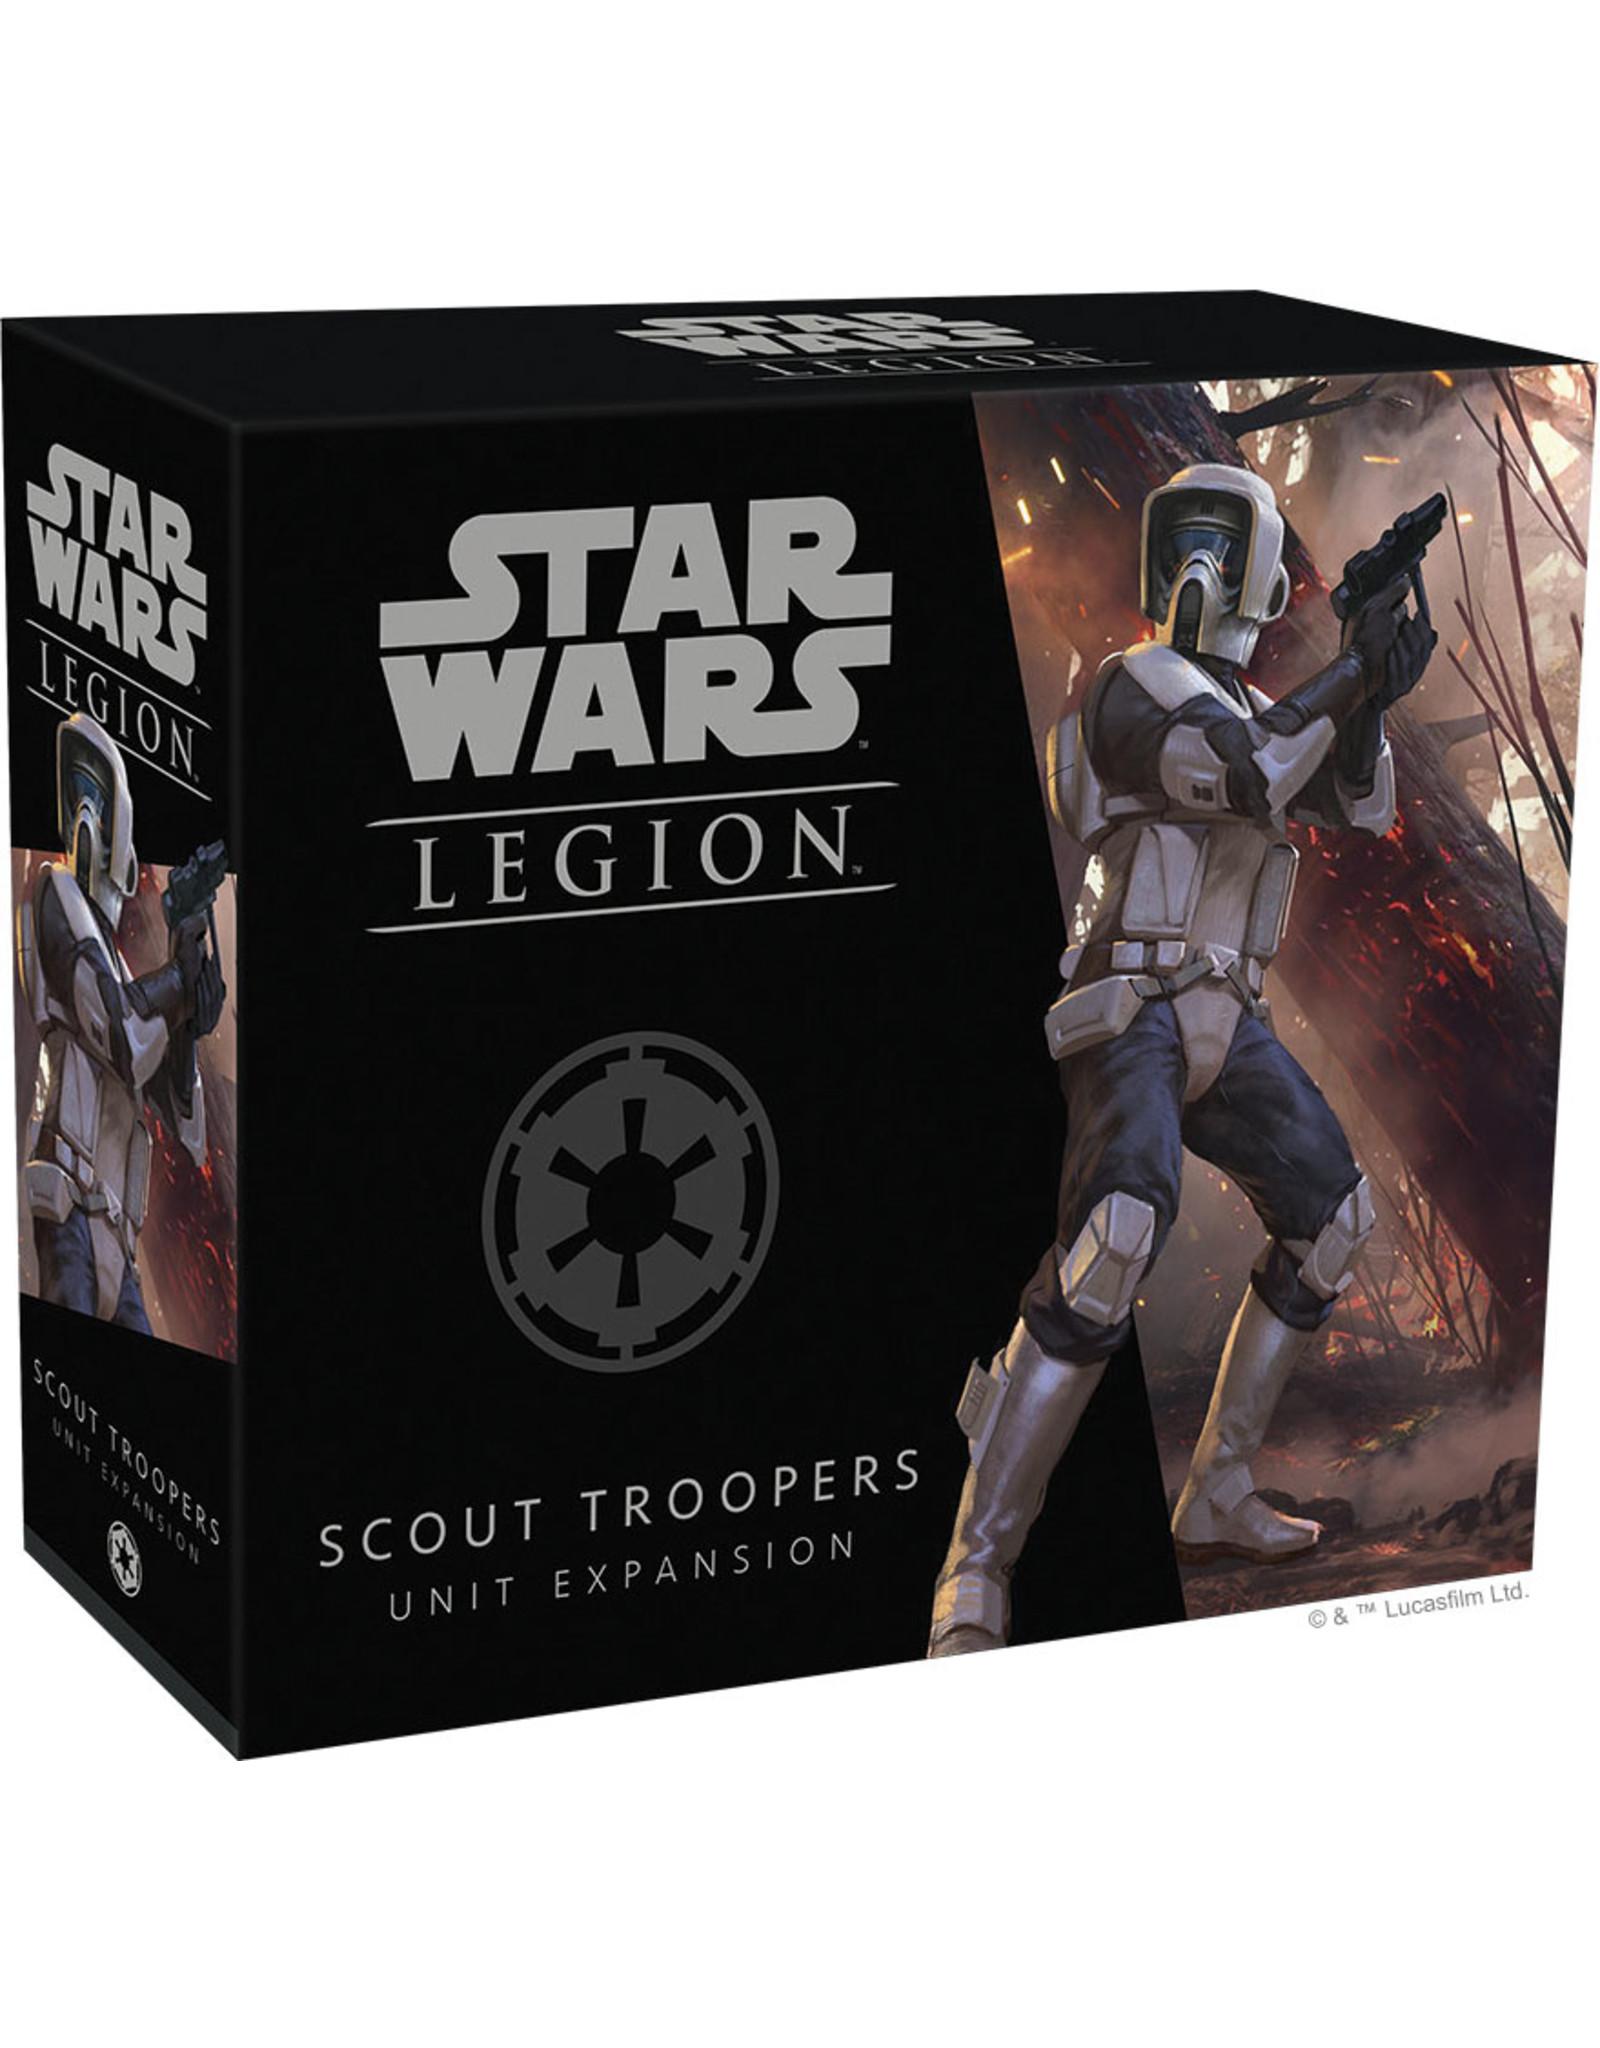 Star Wars: Legion - Scout Troopers